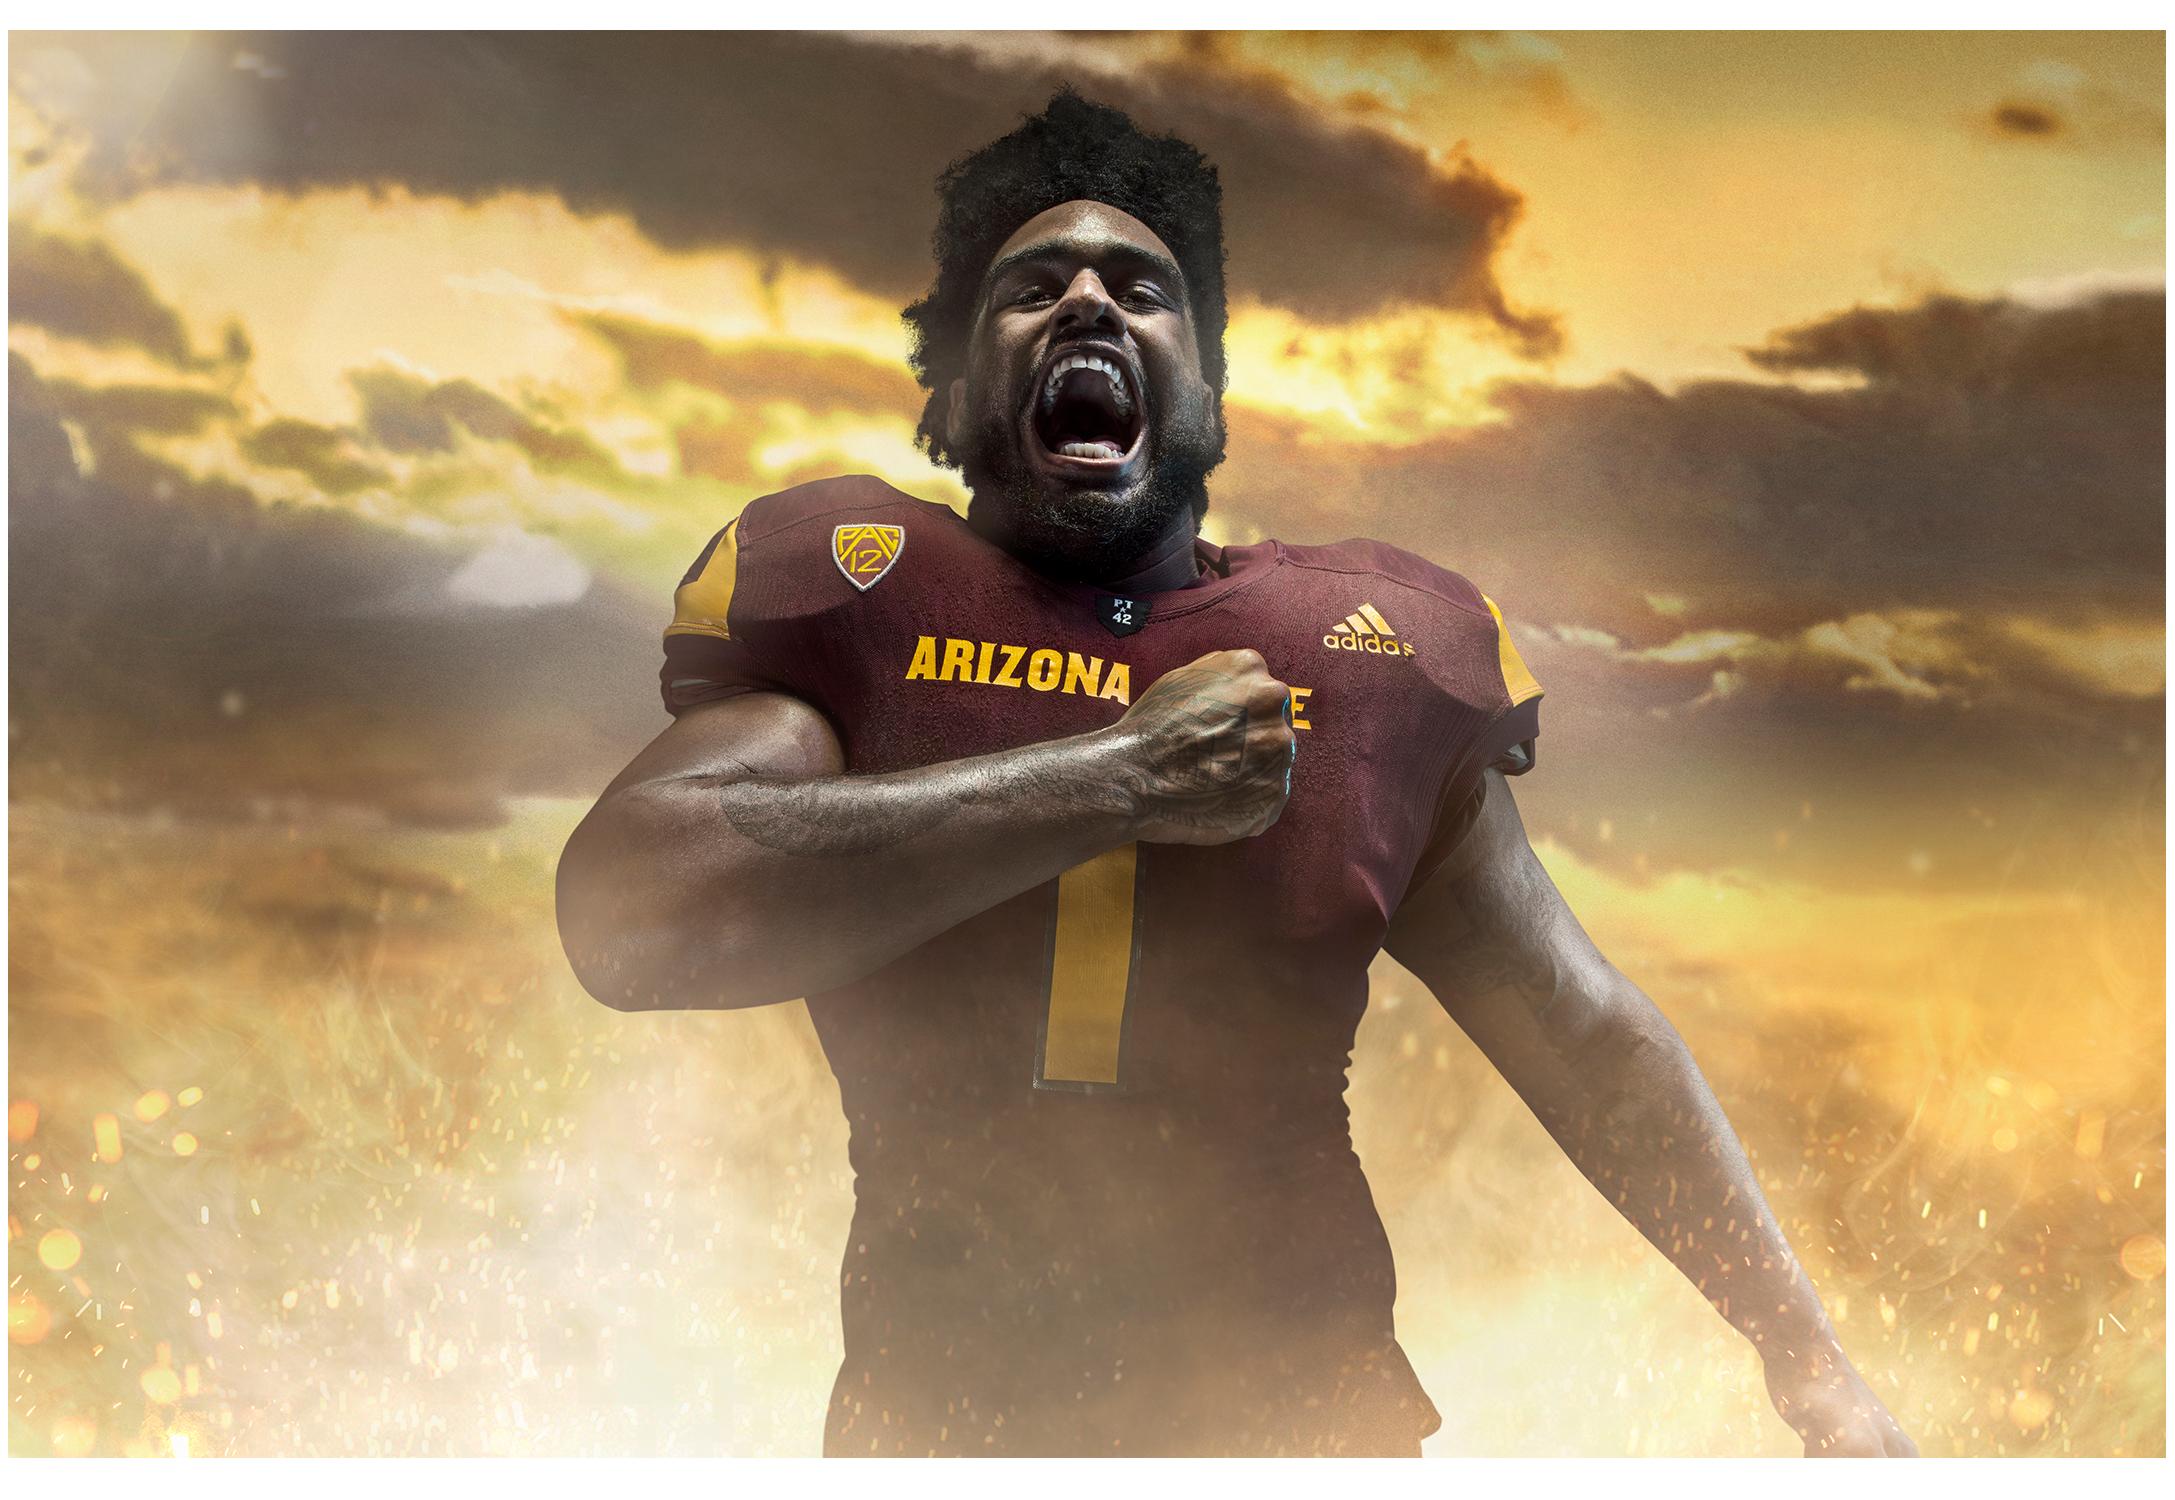 FY18 ASU  SUN DEVIL    FOOTBALL  Photoshoot  Creative + Art Direction  with  photographer   Blair Bunting    cr8@ sun devil athletics, arizona state university